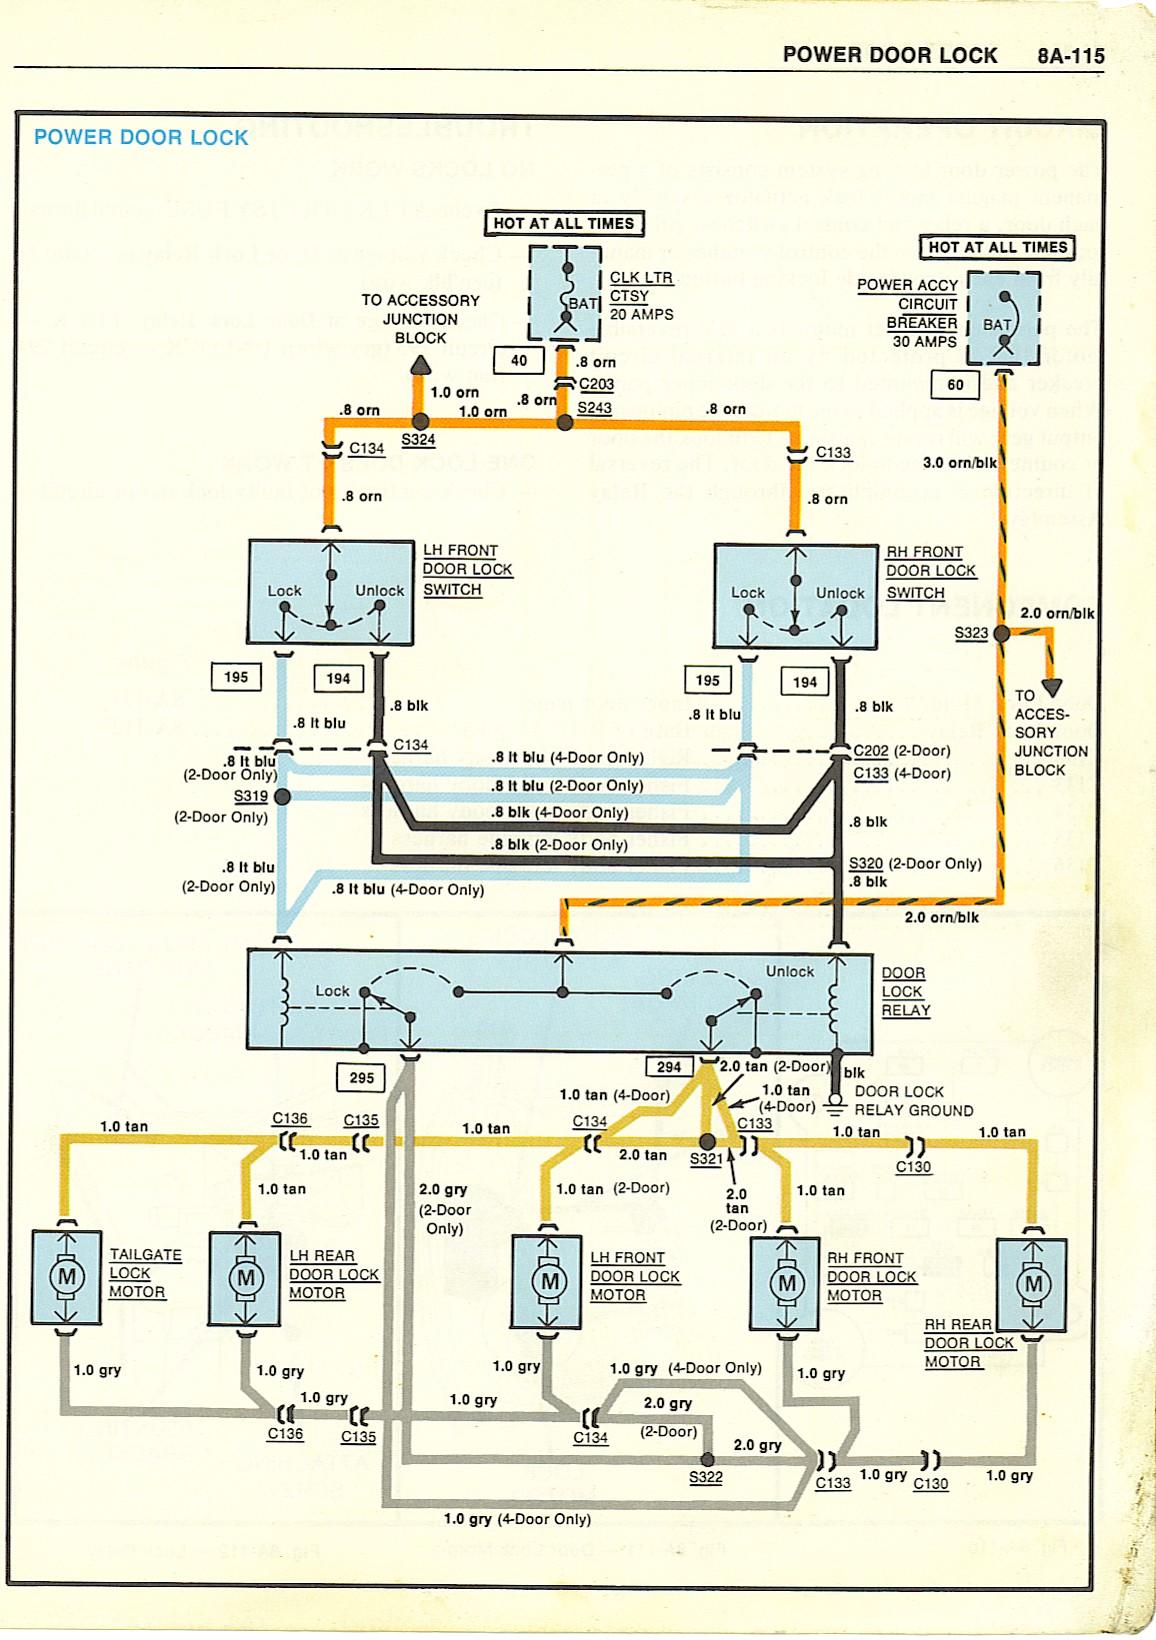 Surprising 1980 Chevy Heater Wiring Wiring Diagram Wiring Cloud Timewinrebemohammedshrineorg